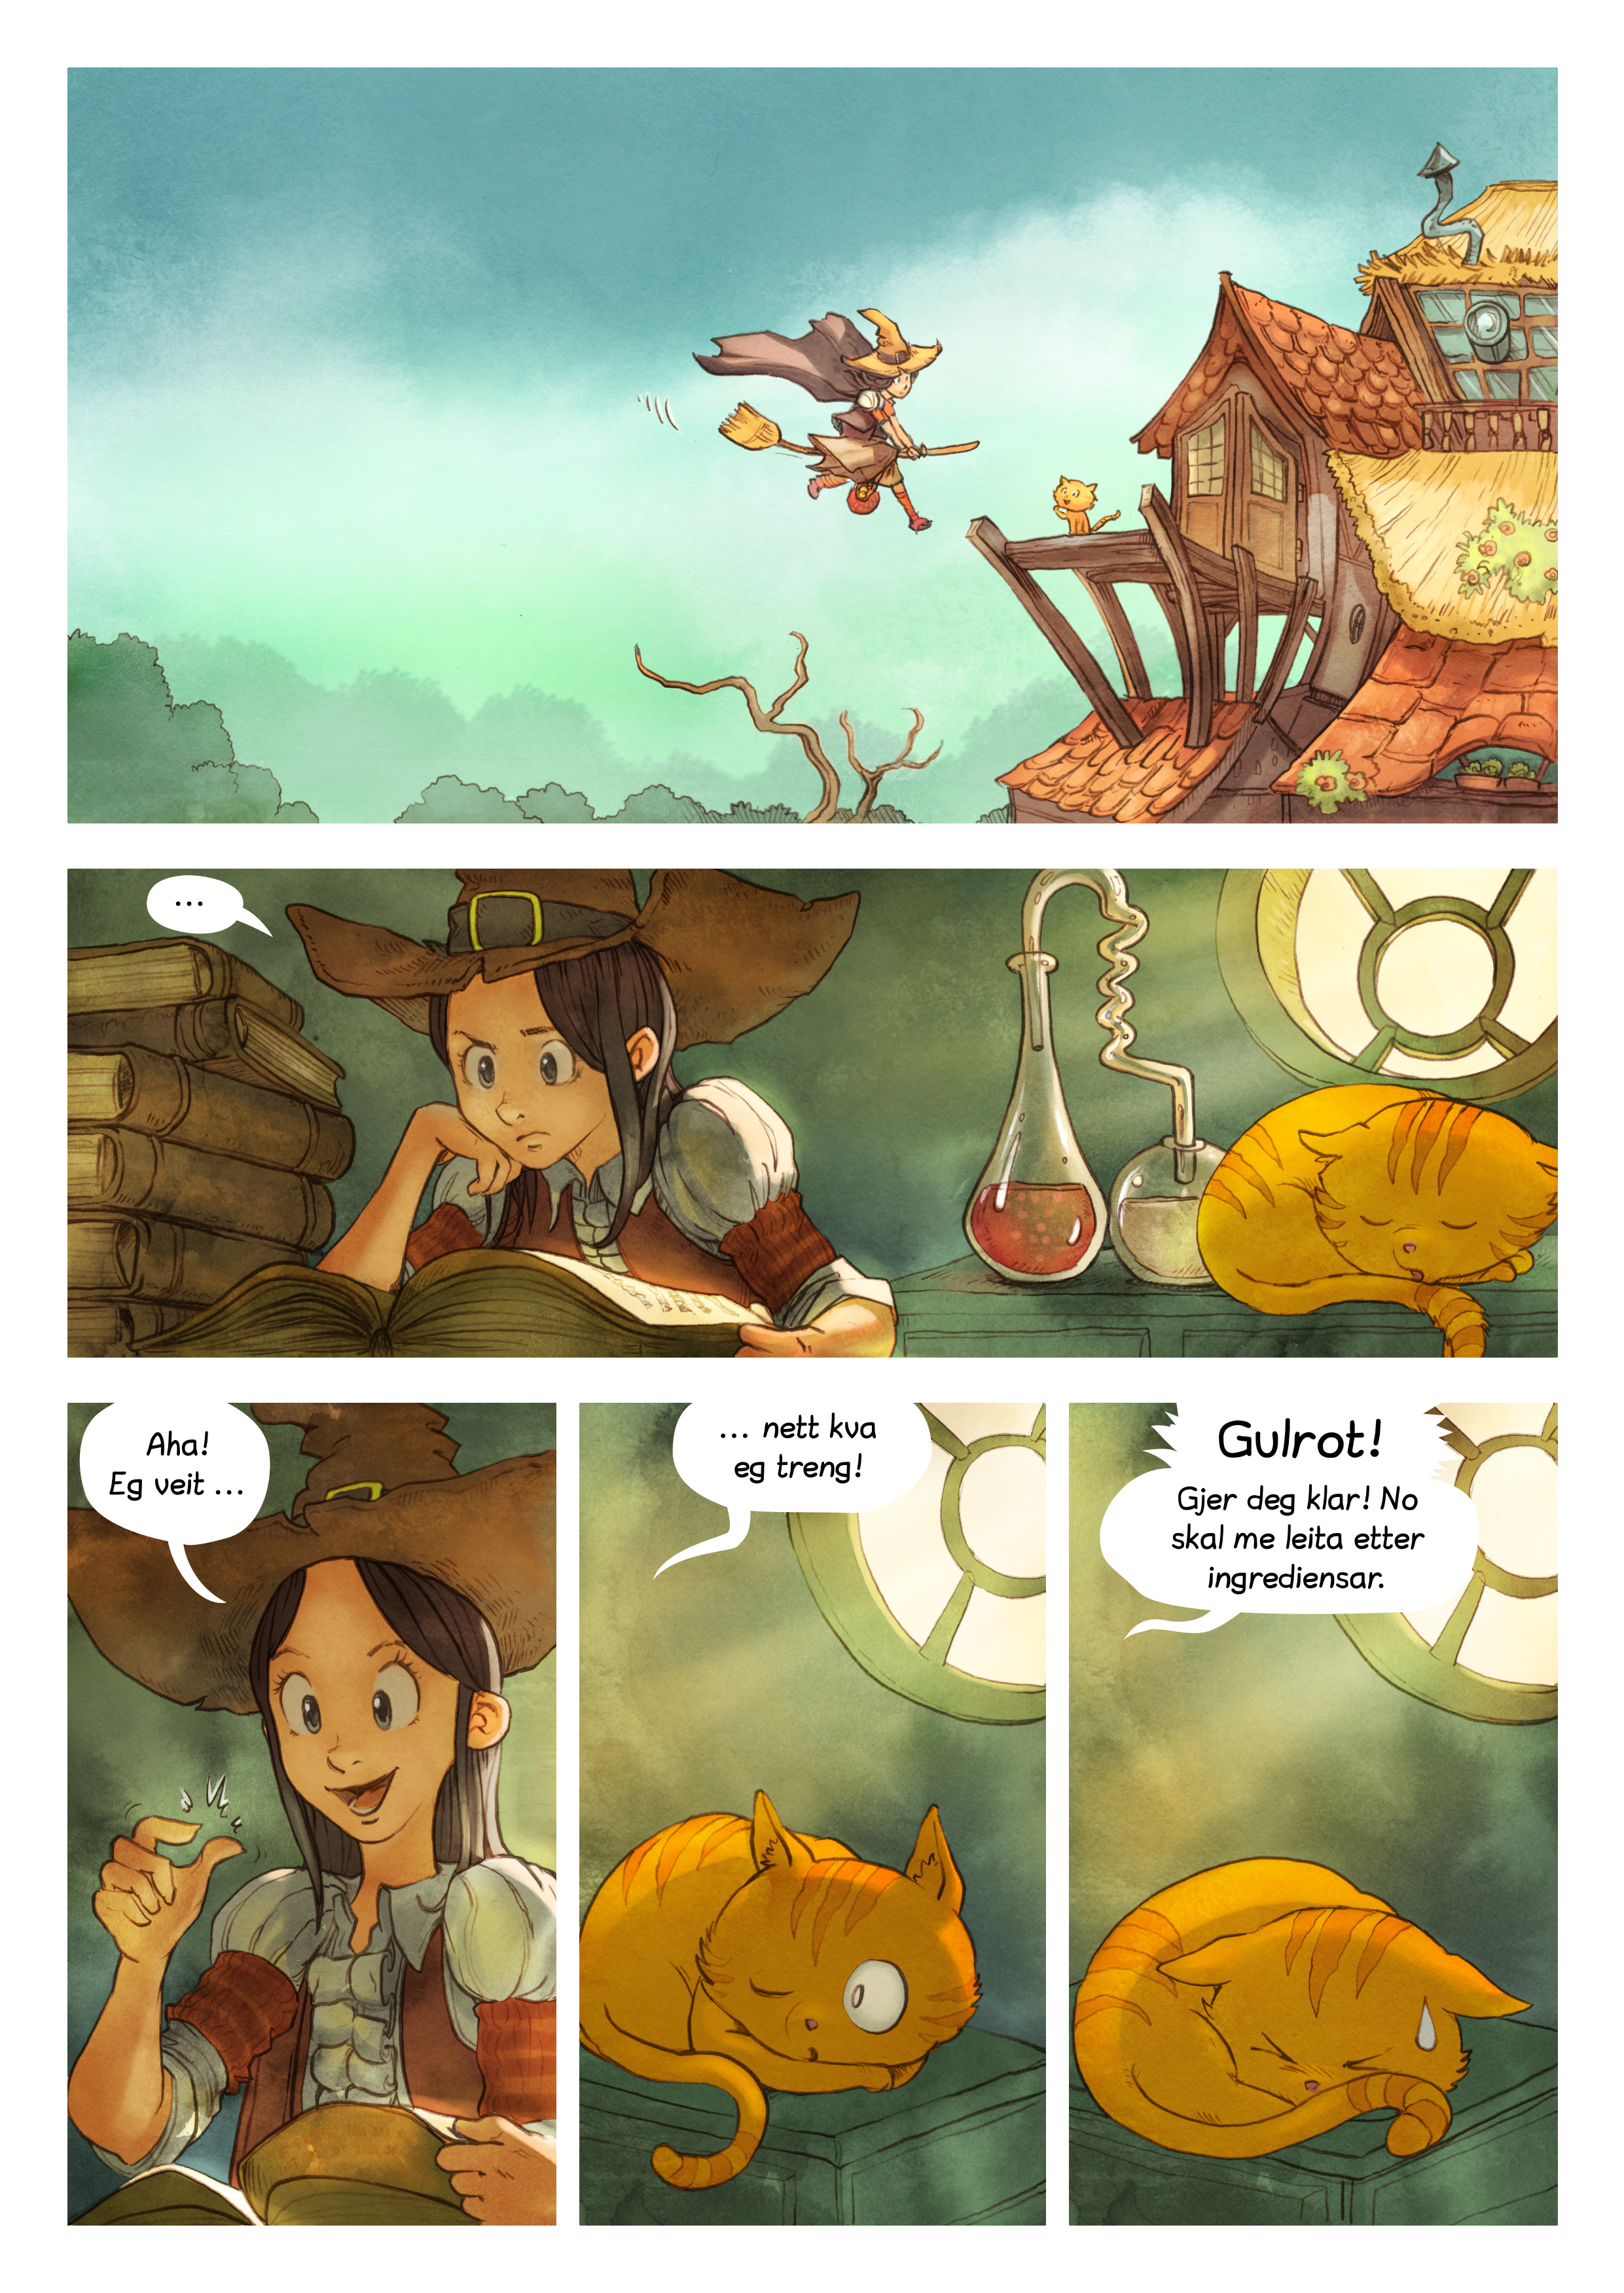 Episode 3: Dei hemmelege ingrediensane, Side 4